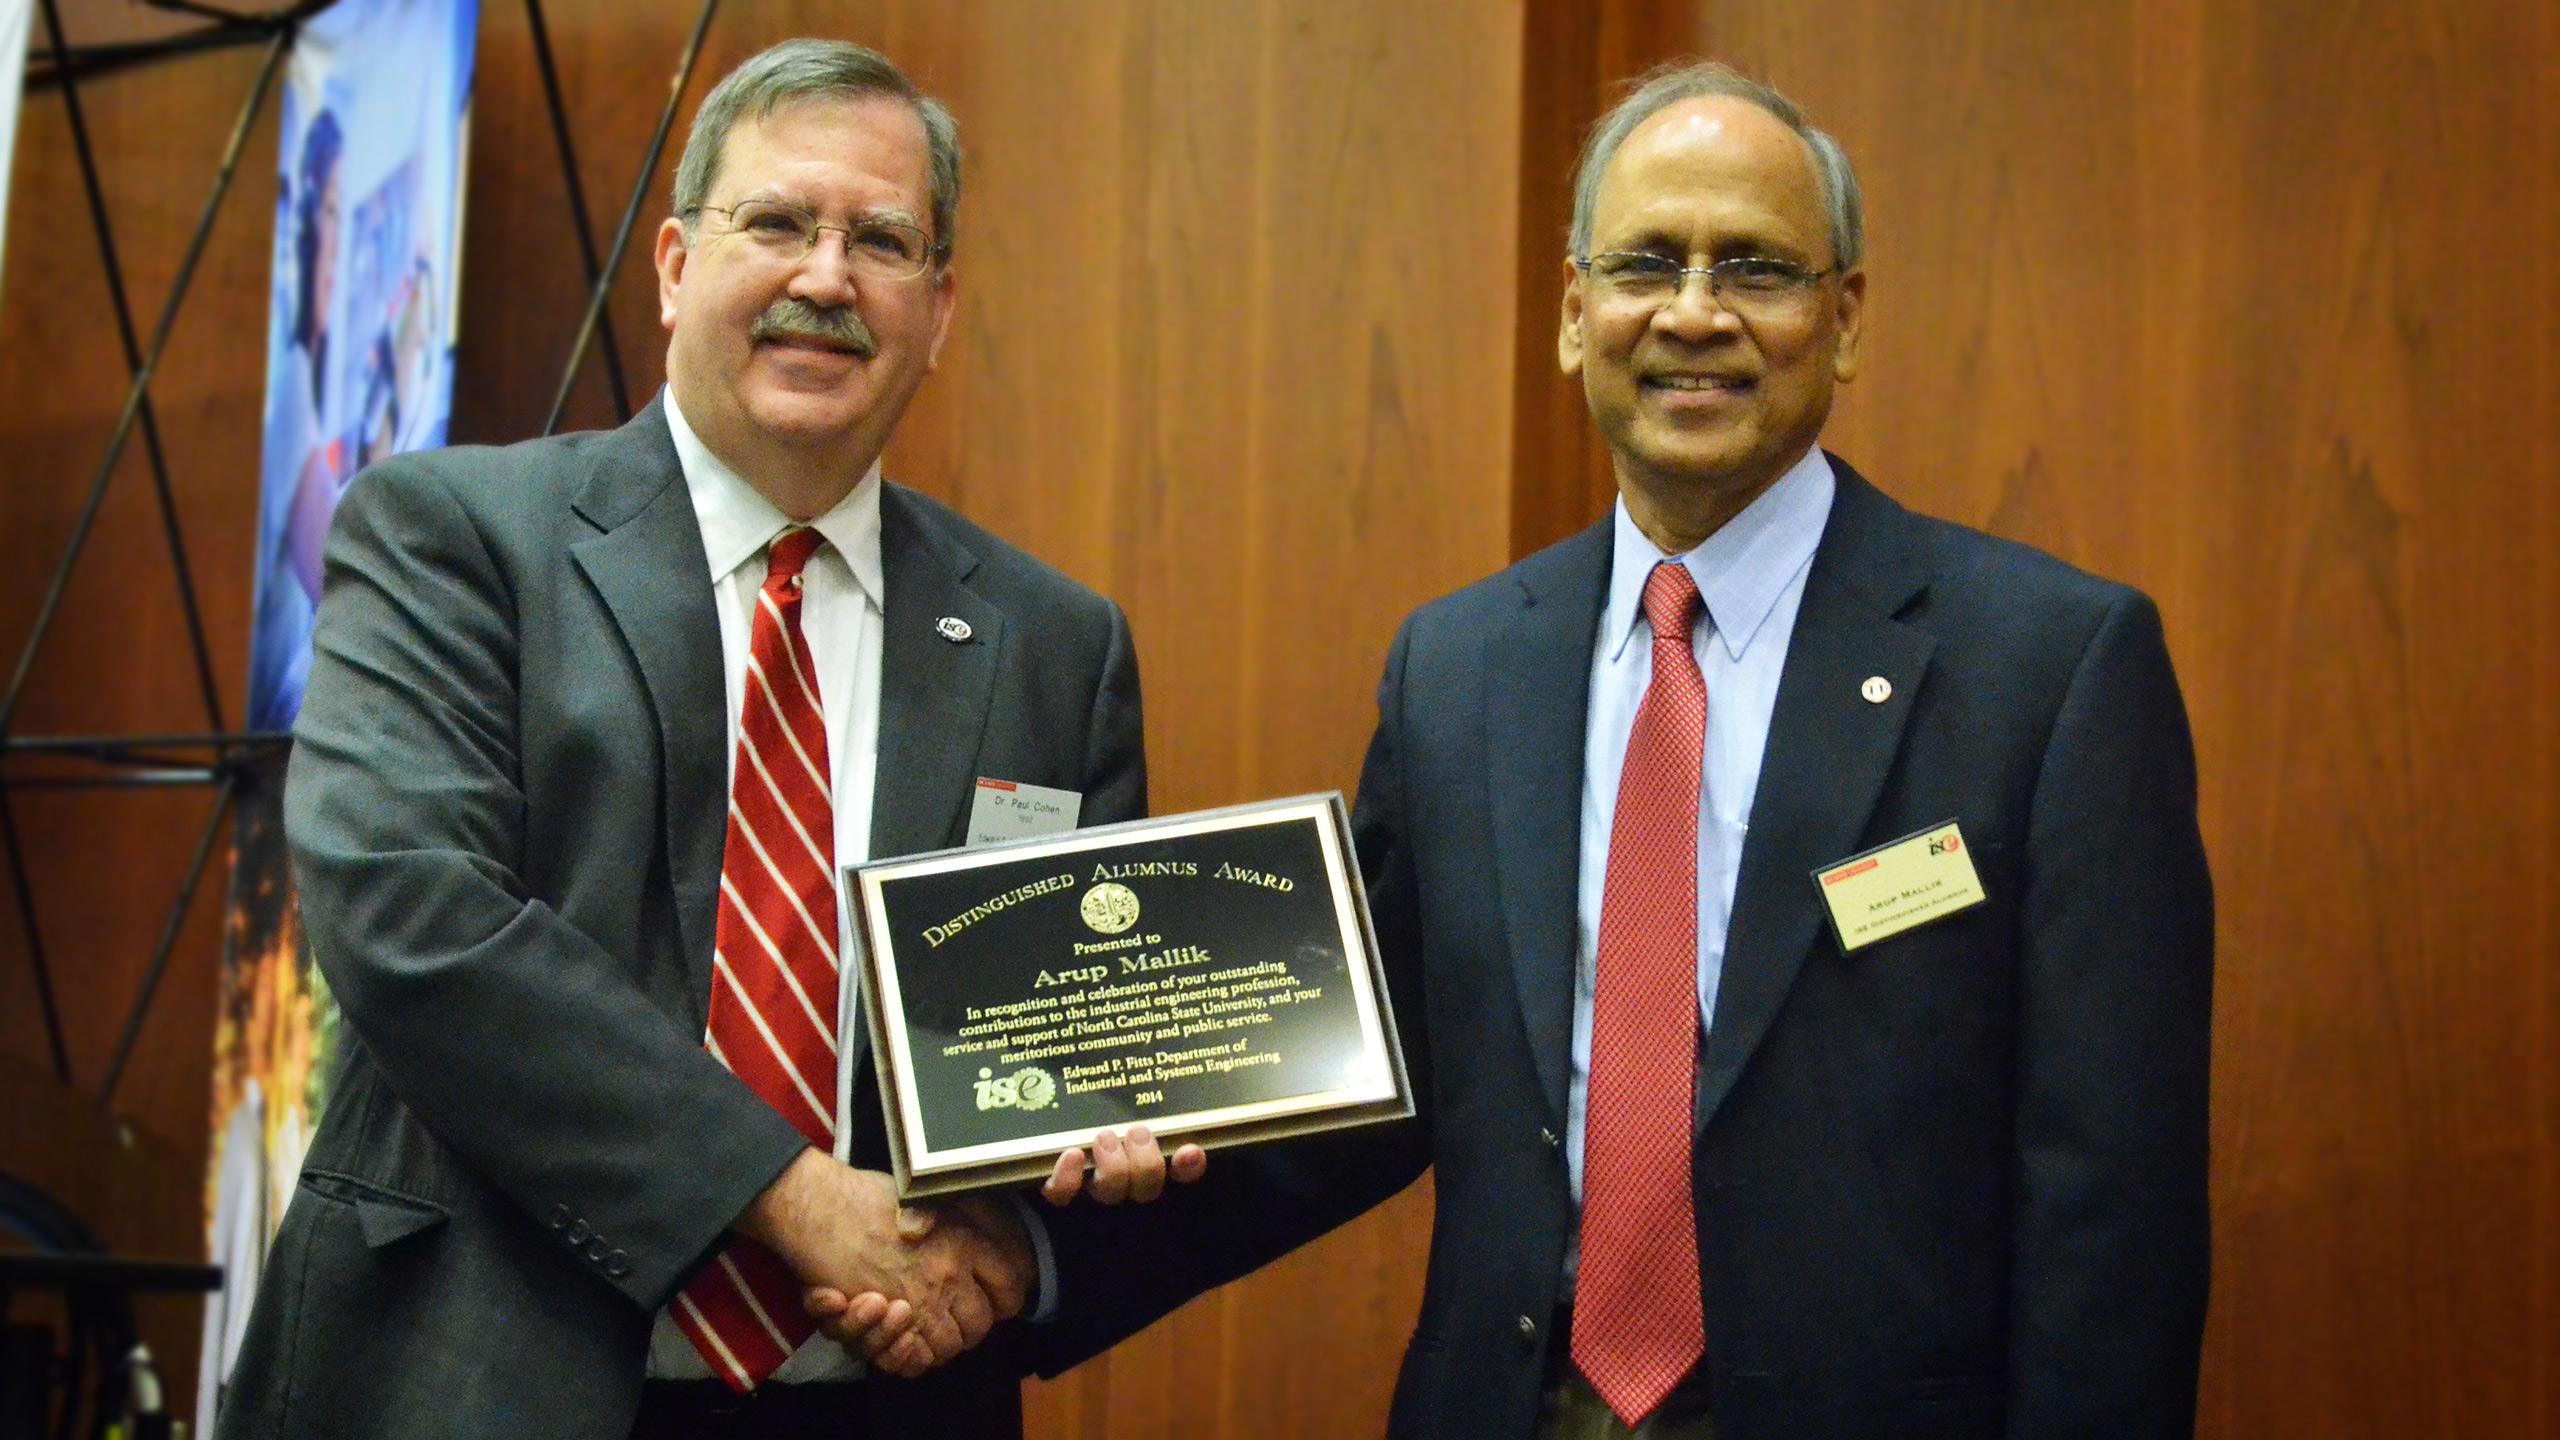 Distinguished Alumni Dr. Arup Mallick